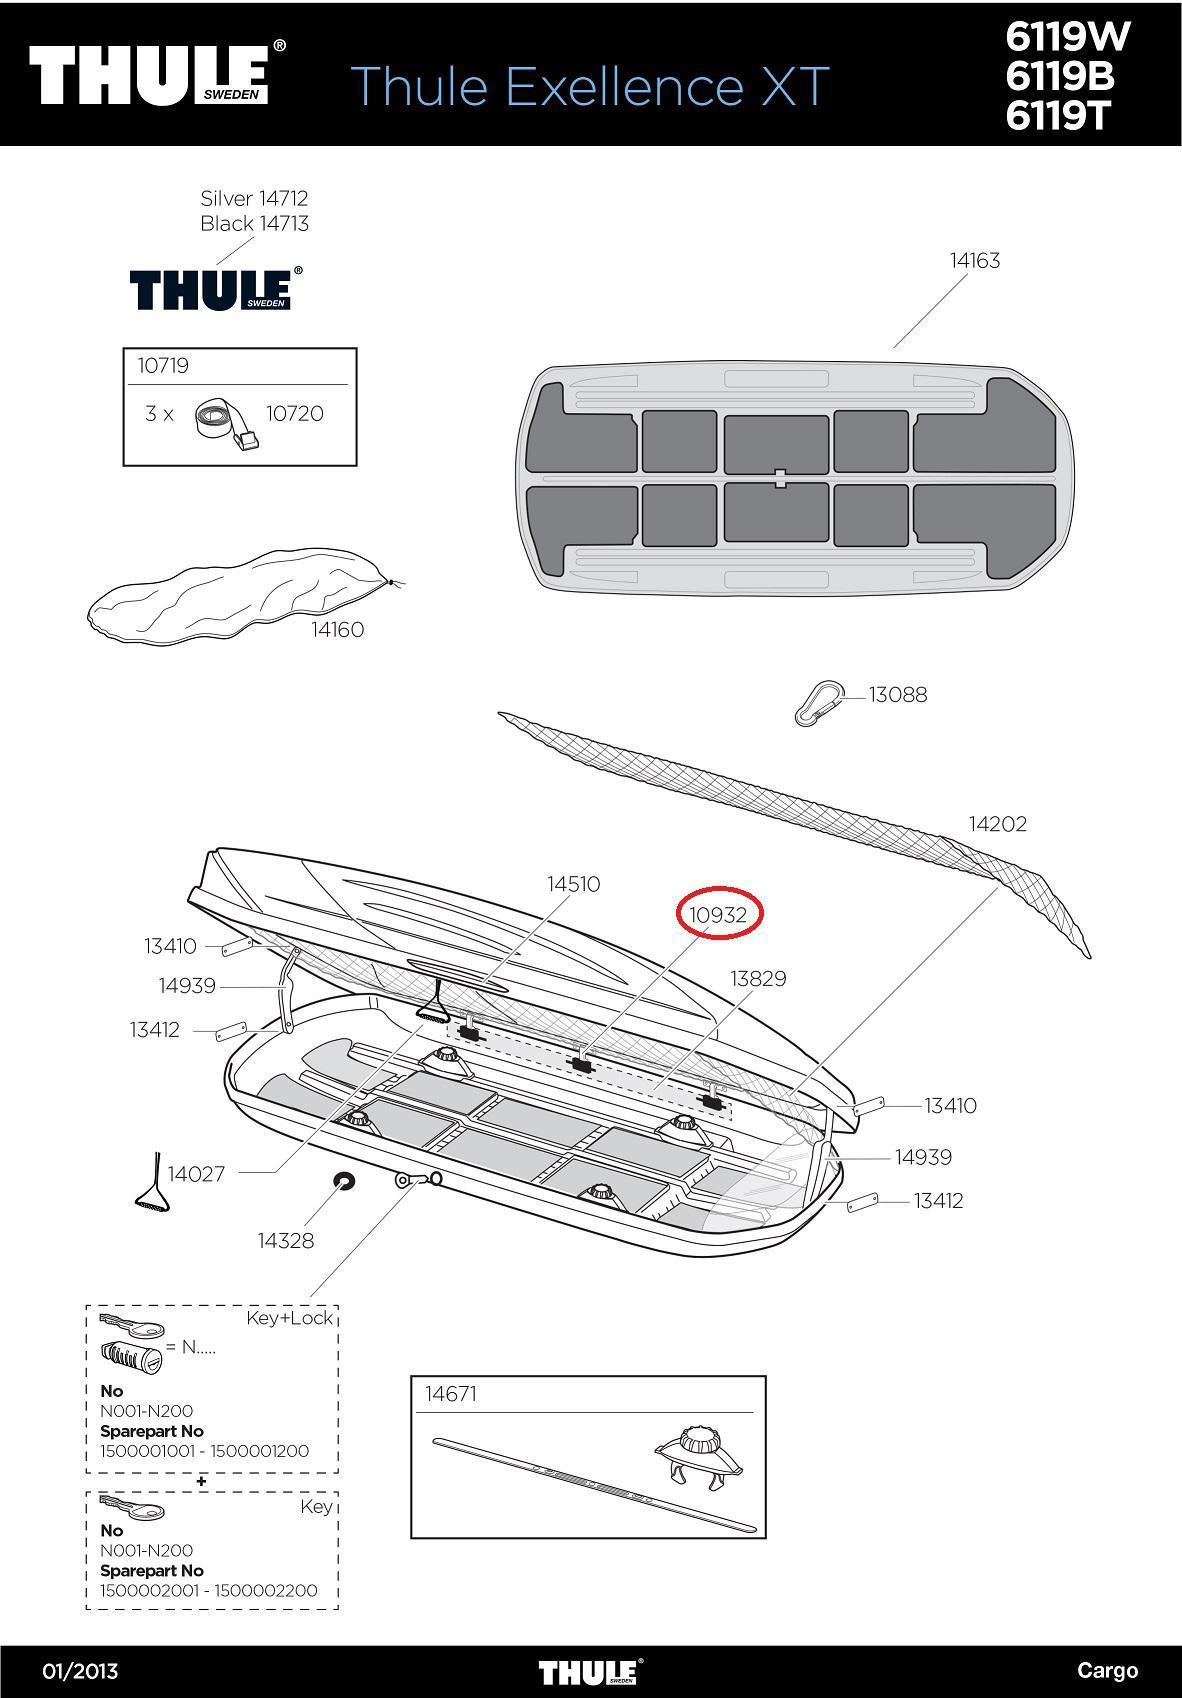 thule schlie haken r l komplett f dachbox motion pacific. Black Bedroom Furniture Sets. Home Design Ideas